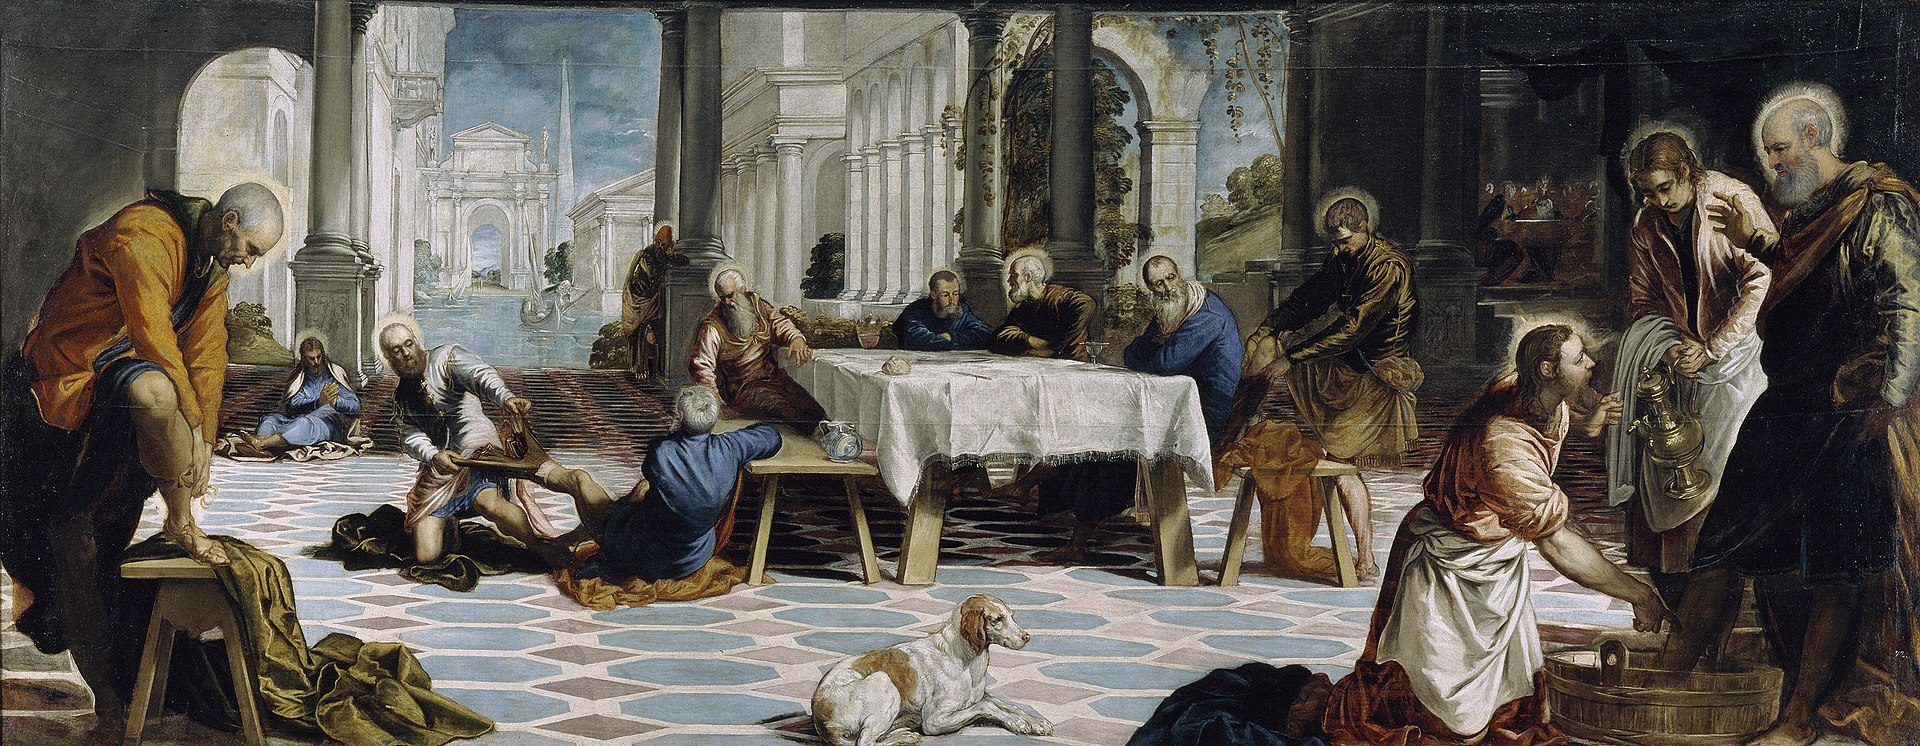 Cuadro El Lavatorio Tintoretto perspectiva